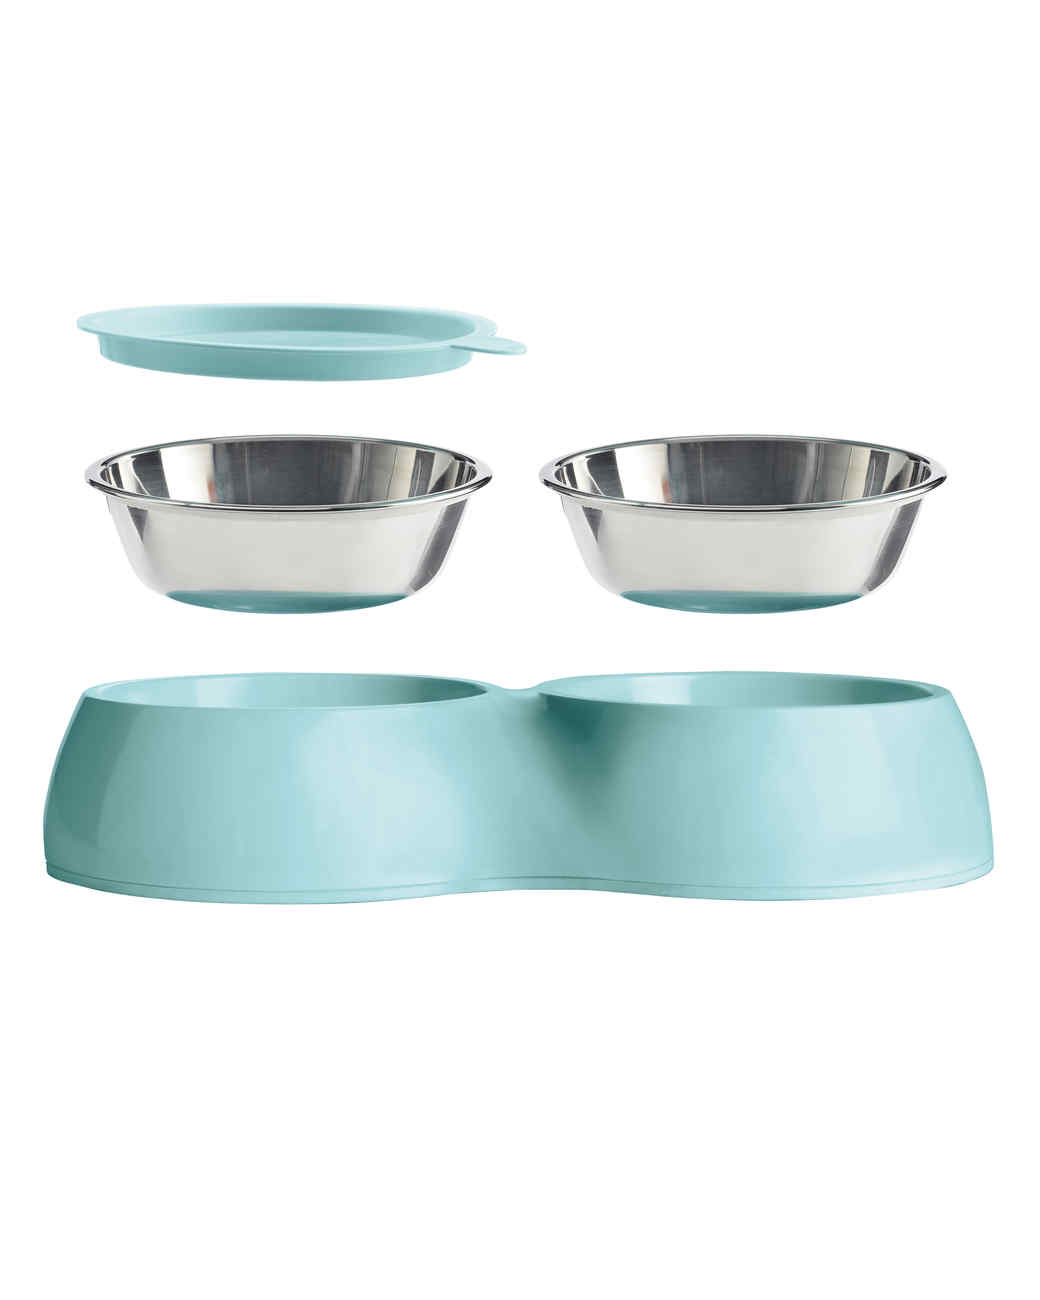 petiquette-blue_doublefeederbowl_one-lid.jpg